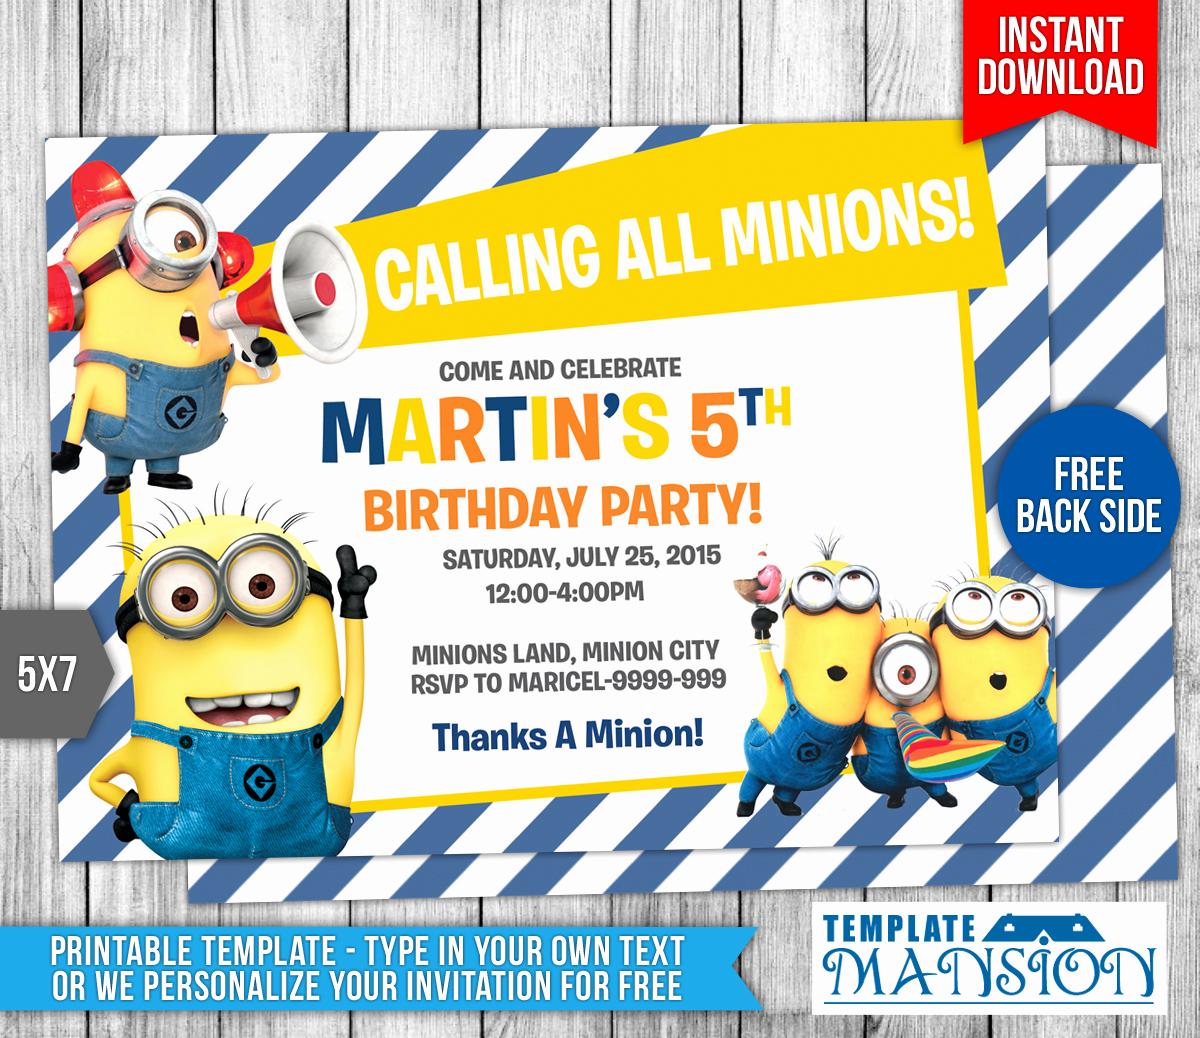 Free Minion Invitation Templates Beautiful Minions Birthday Invitation 7 by Templatemansion On